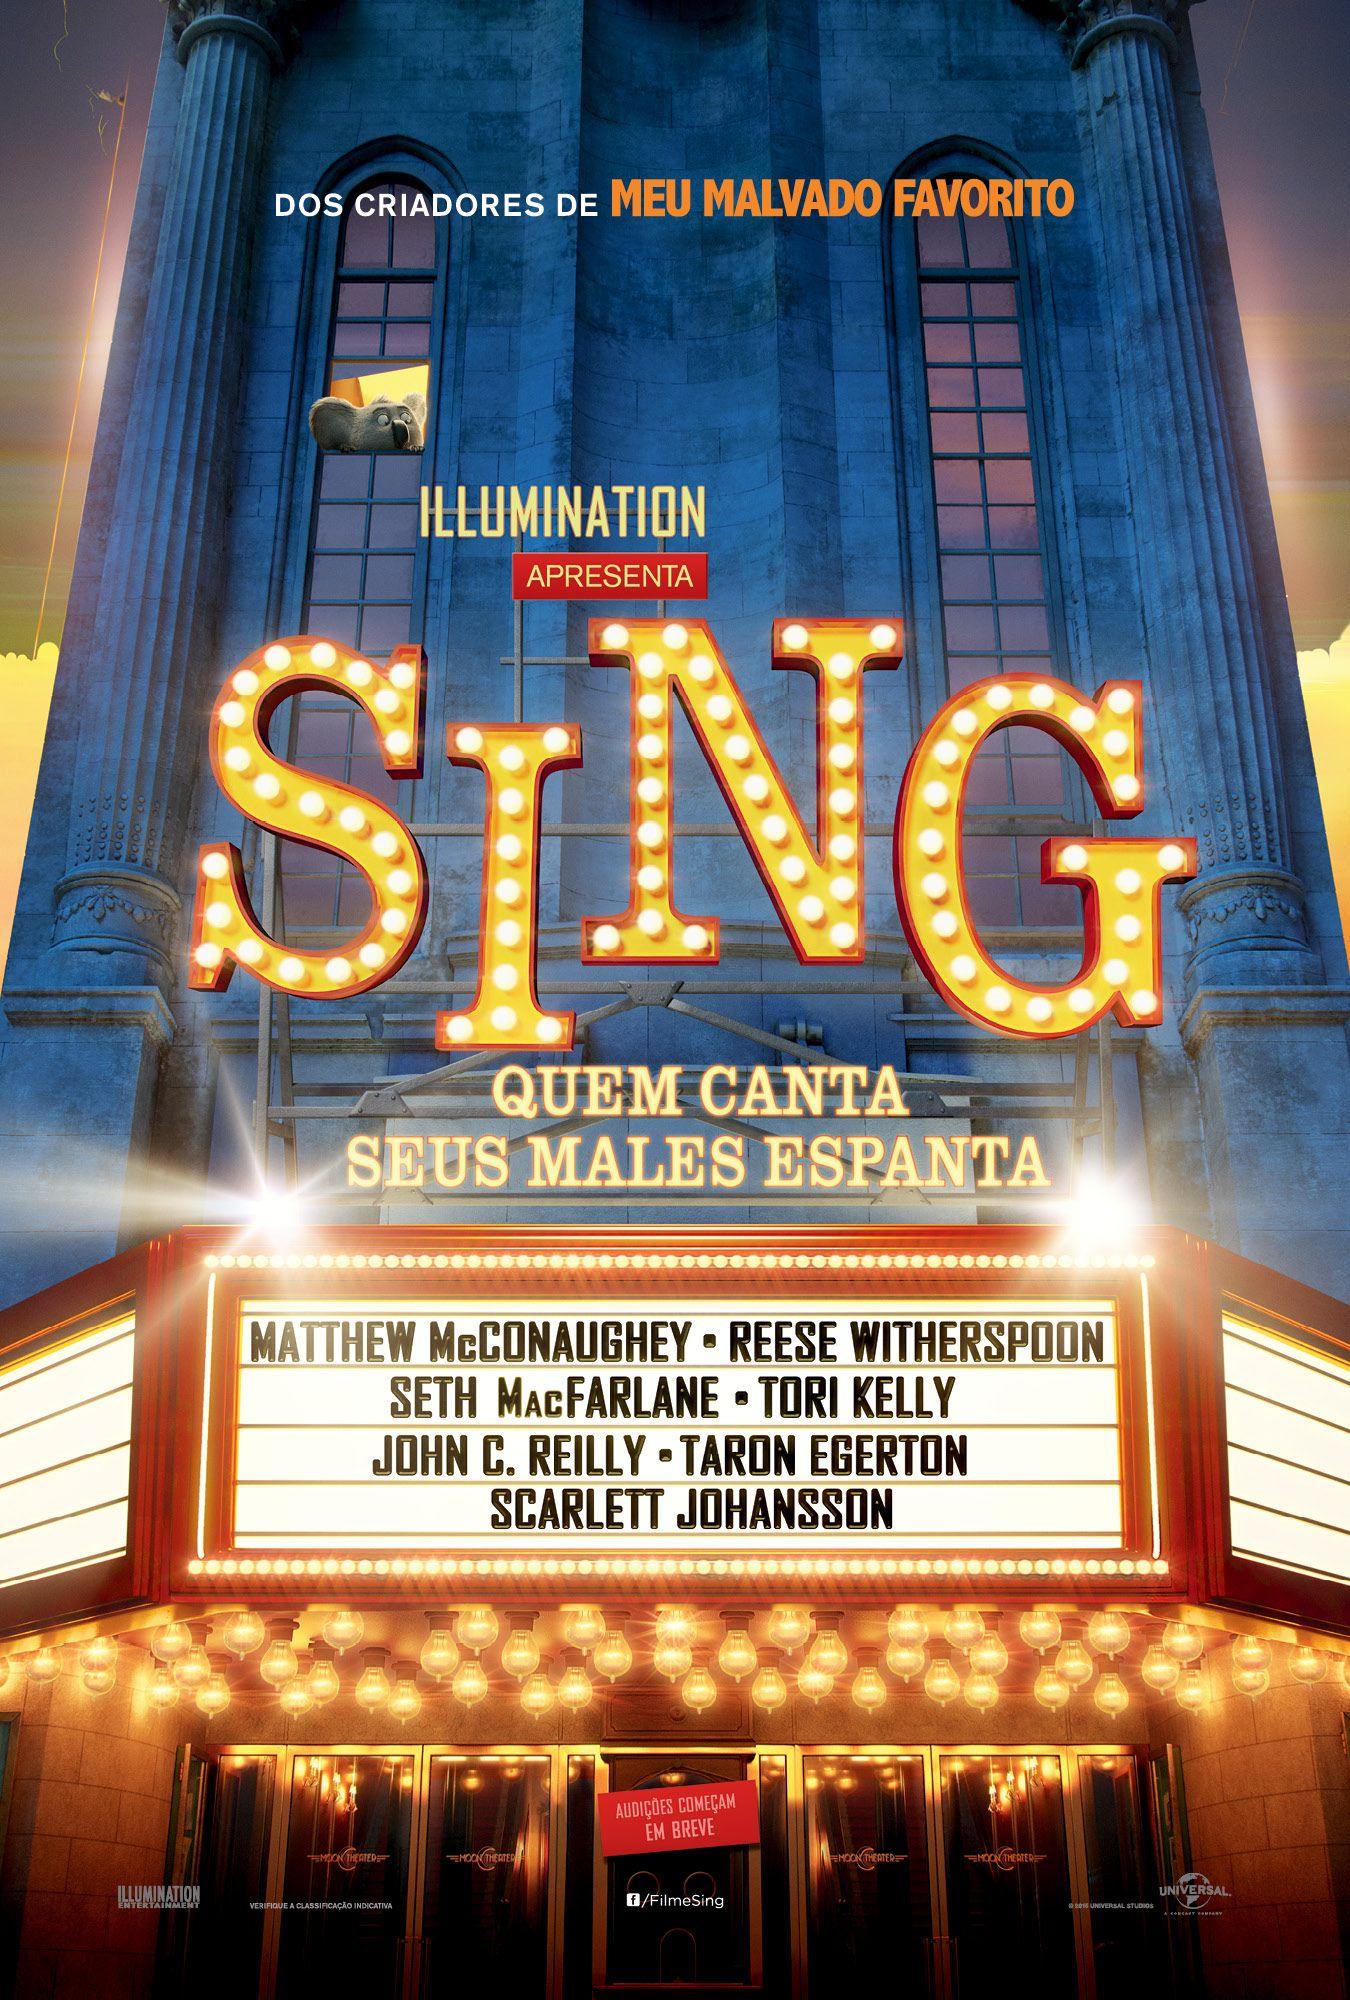 Cartaz De Sing Quem Canta Seus Males Espanta Dezembro Nos